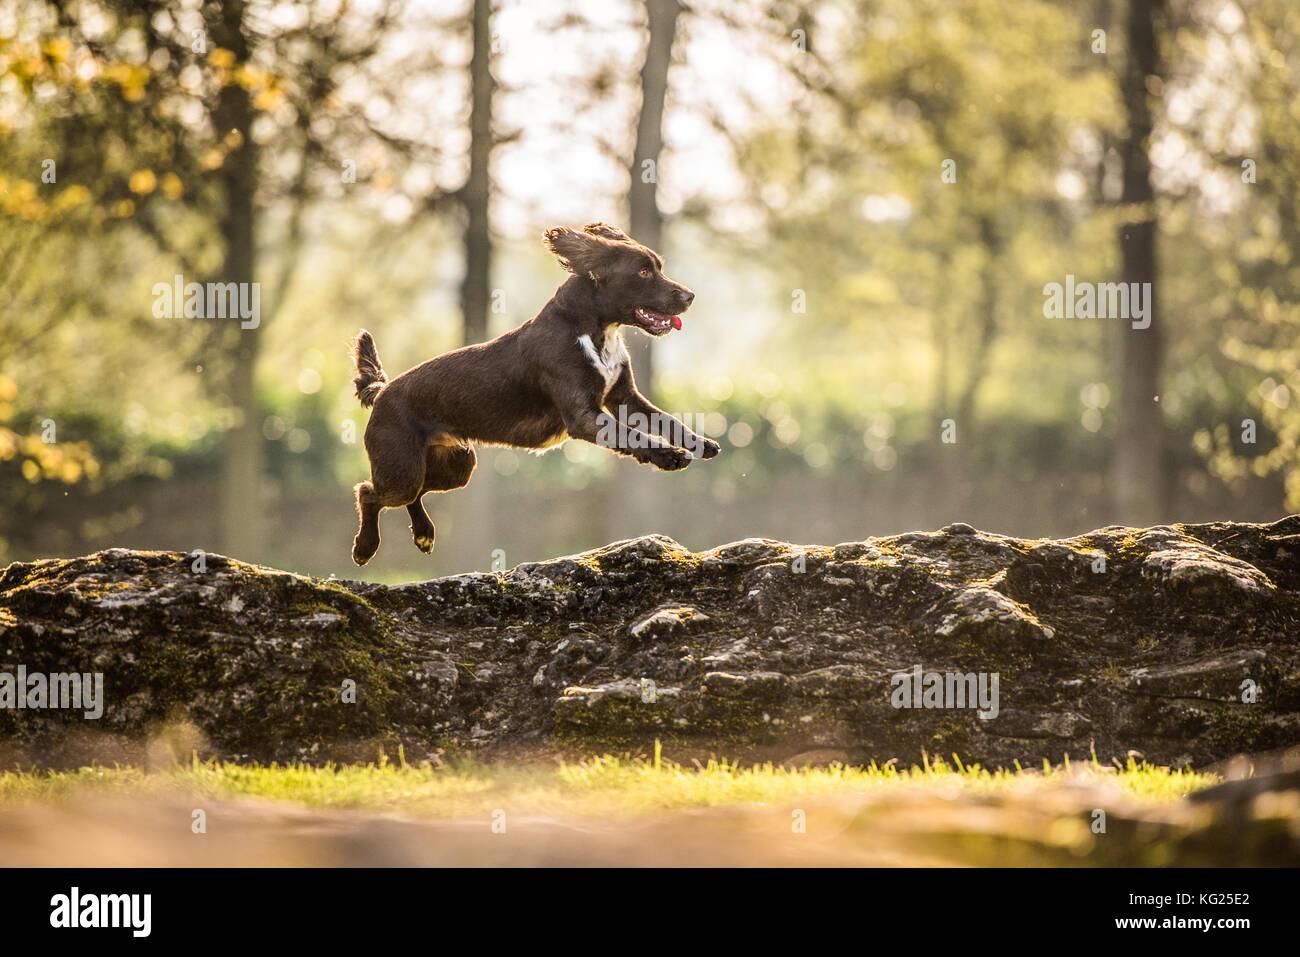 Jumping cocker spaniel, Oxfordshire, England, United Kingdom, Europe - Stock Image